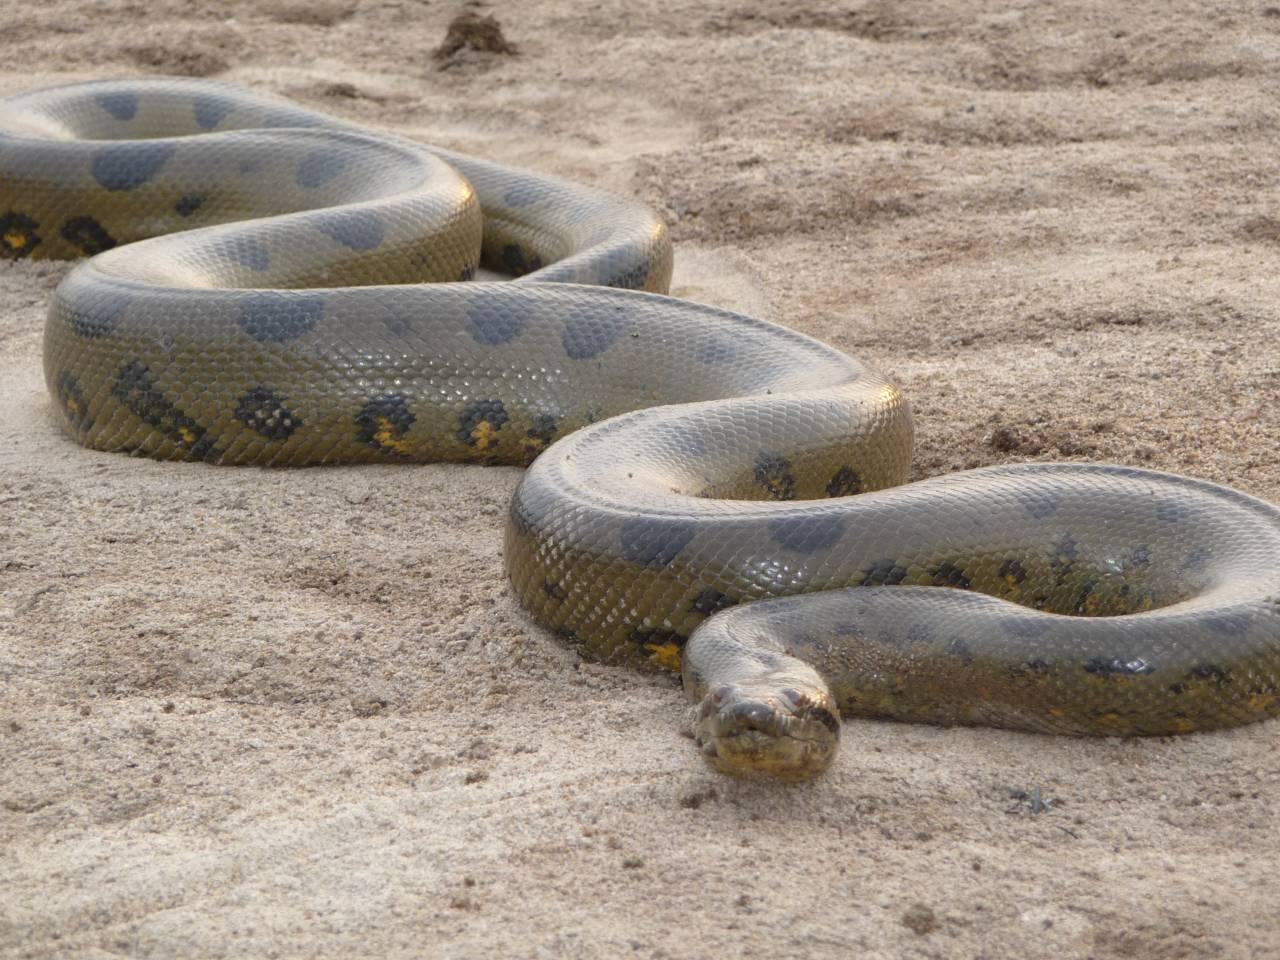 Anaconda Coloring Pages